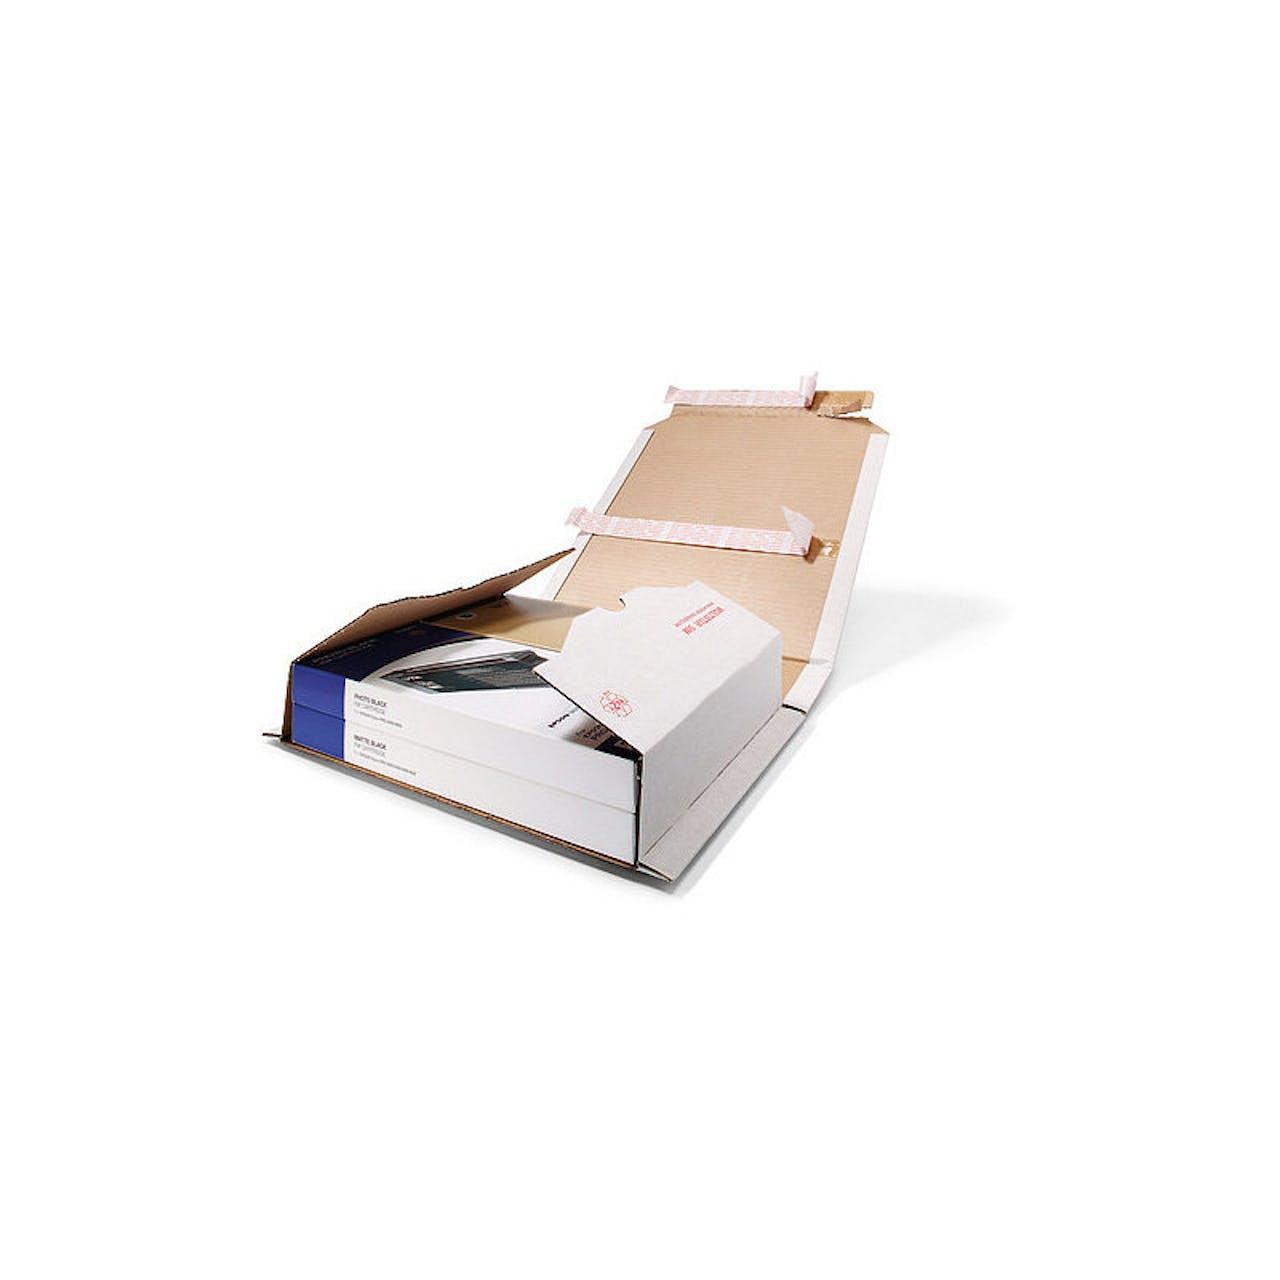 Buchverpackung, weiß, 320 x 455 mm, DIN A3, Füllh. 0–54 mm, 2-fache Selbstkleb.